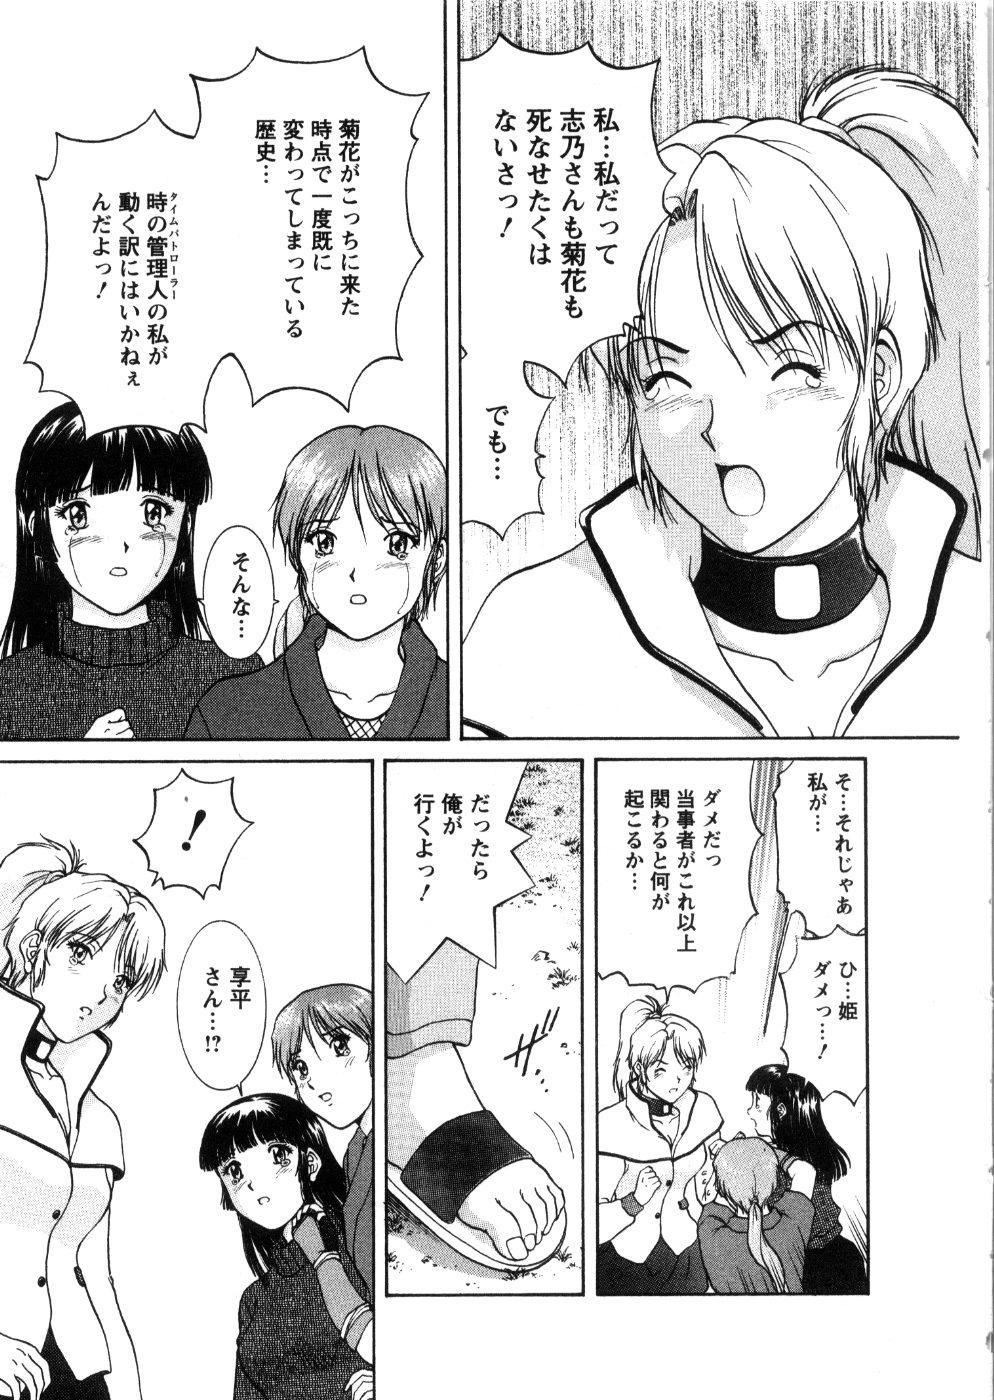 Oneechan-tachi ga Yatte Kuru 03 18